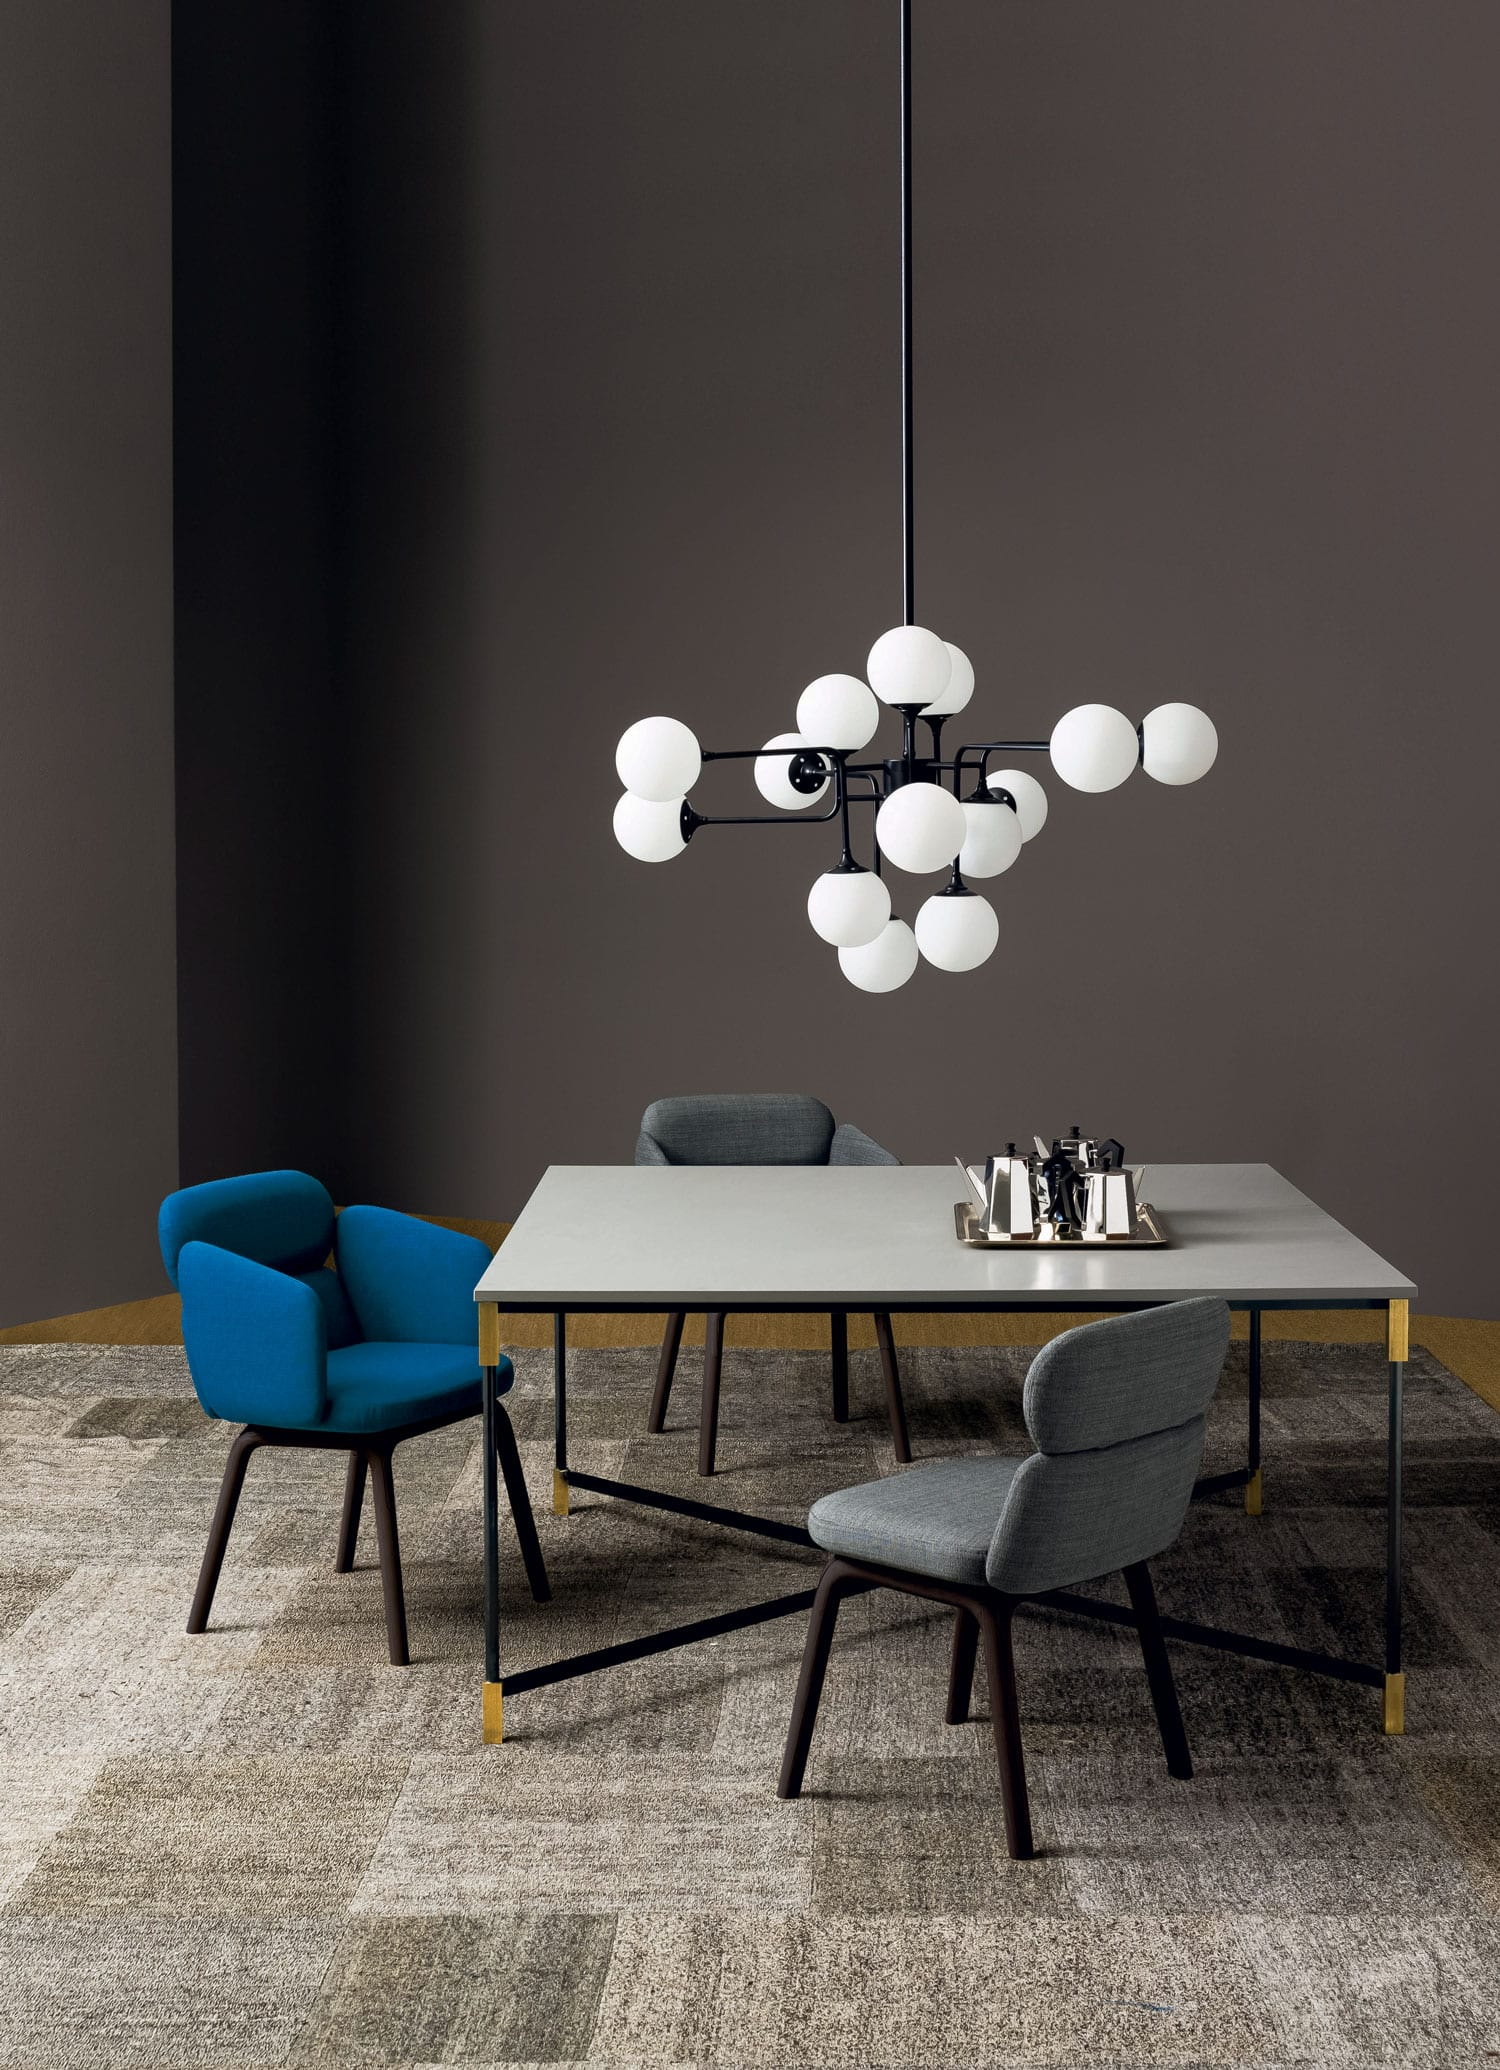 Match Table by Paola Vella - Ellen Bernhardt | Yellowtrace